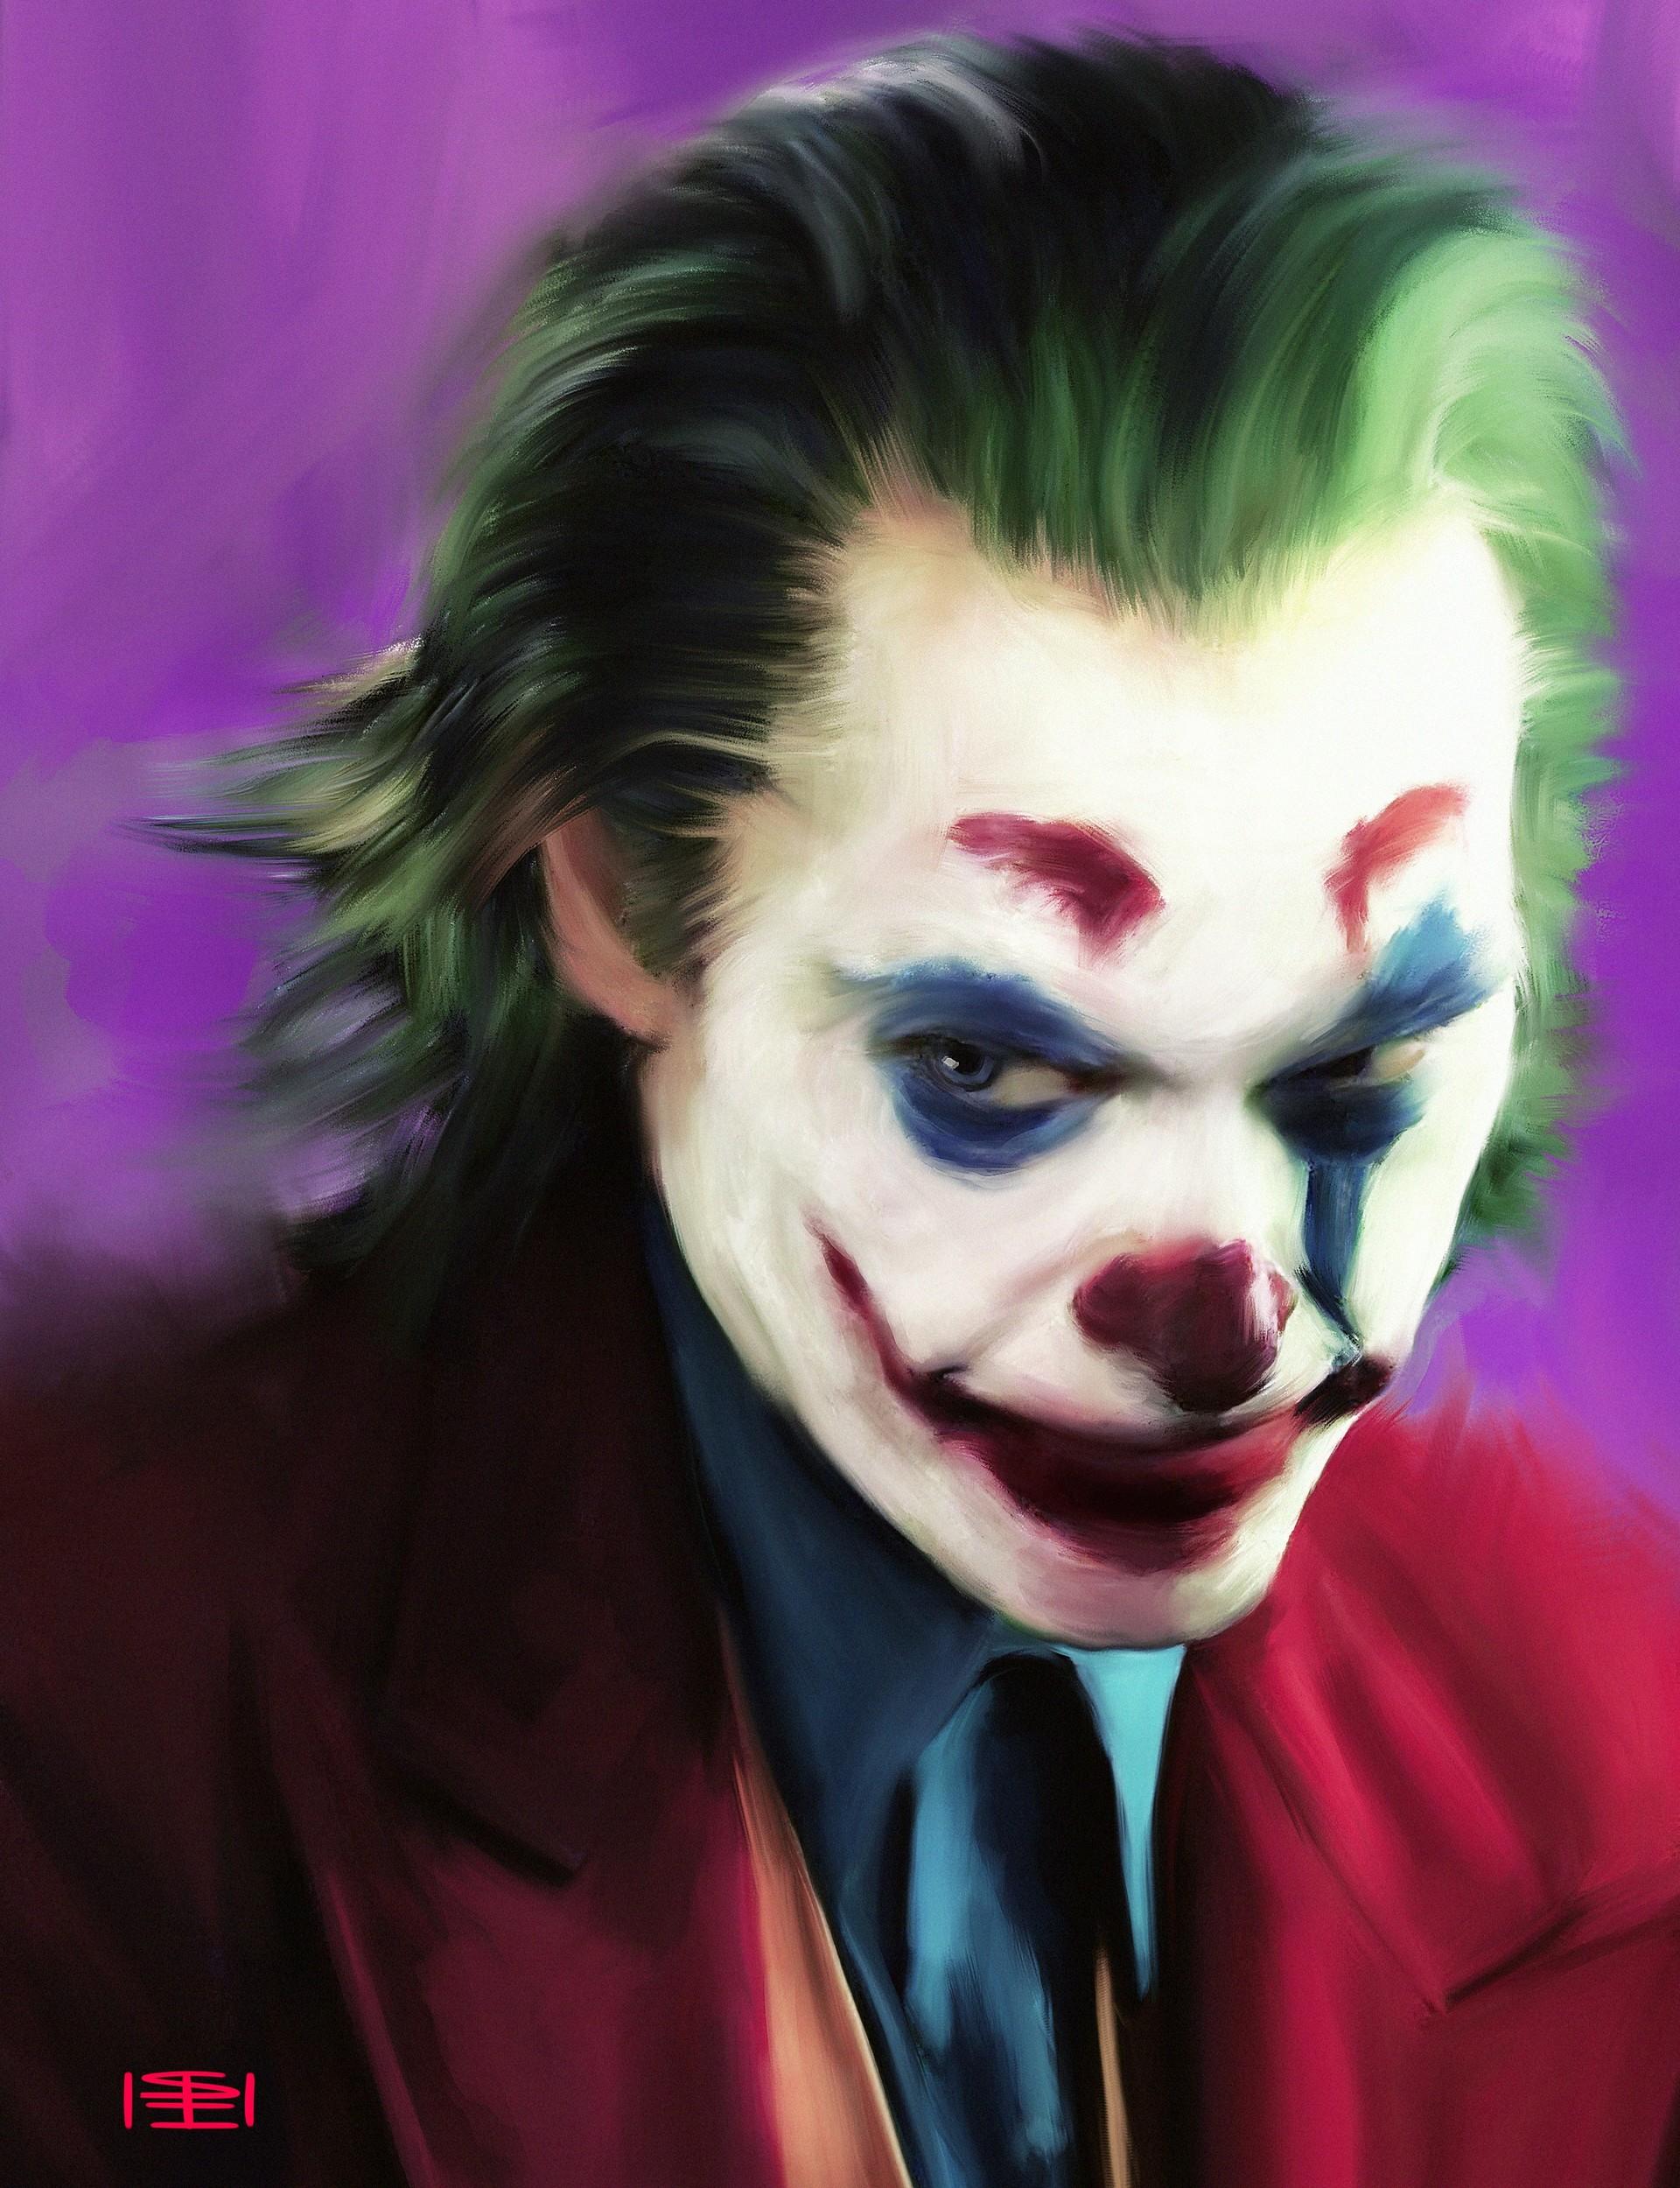 Wallpaper Joker Movies 2019 Artwork Digital Art